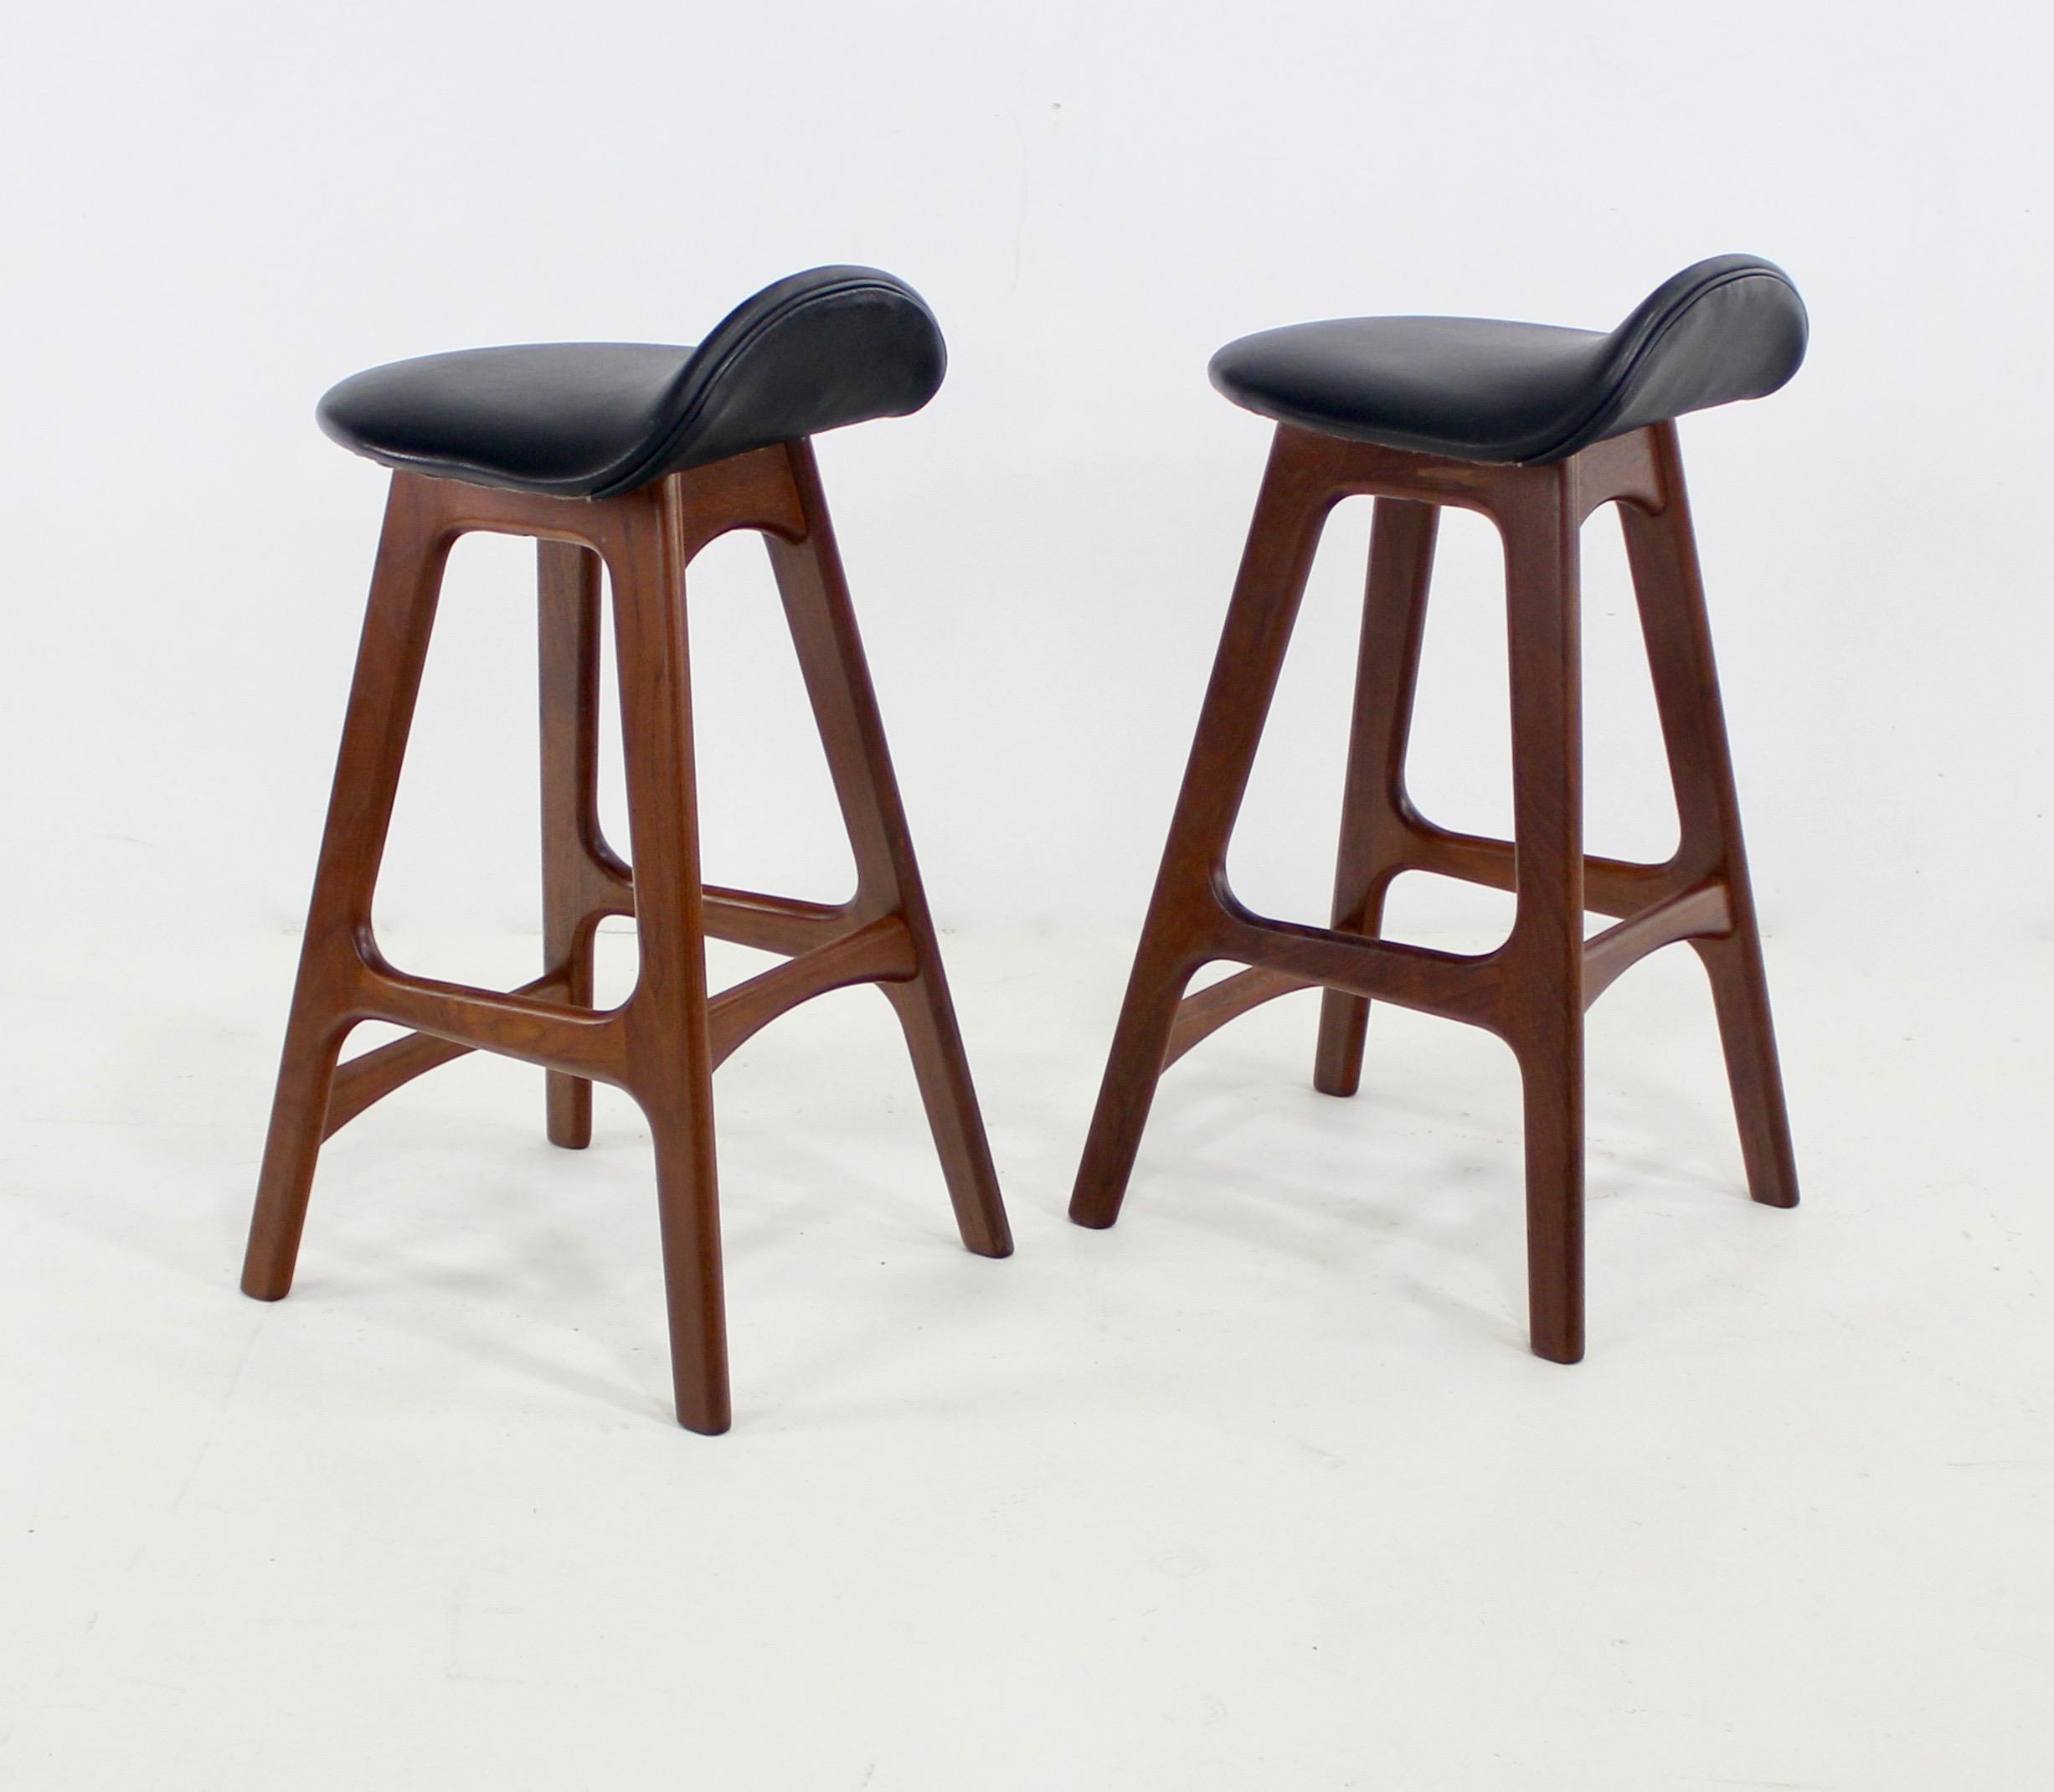 Danish Counter Seat: Pair Of Danish Modern Teak Counter Stools Designed By Erik